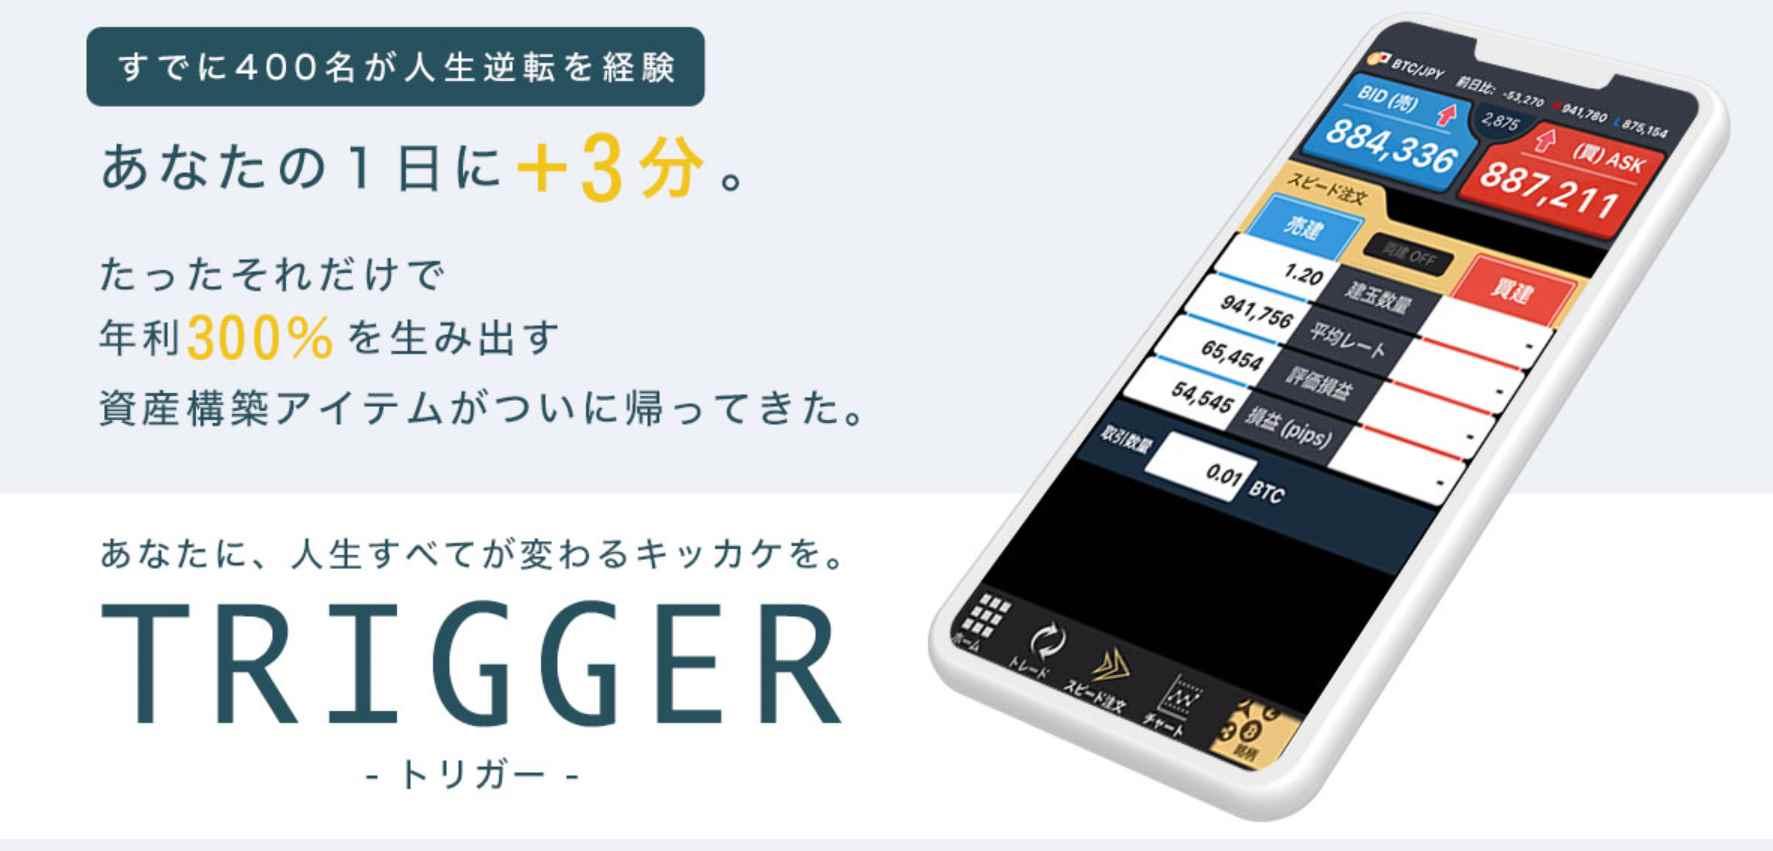 TRIGGER(トリガー)天野健志